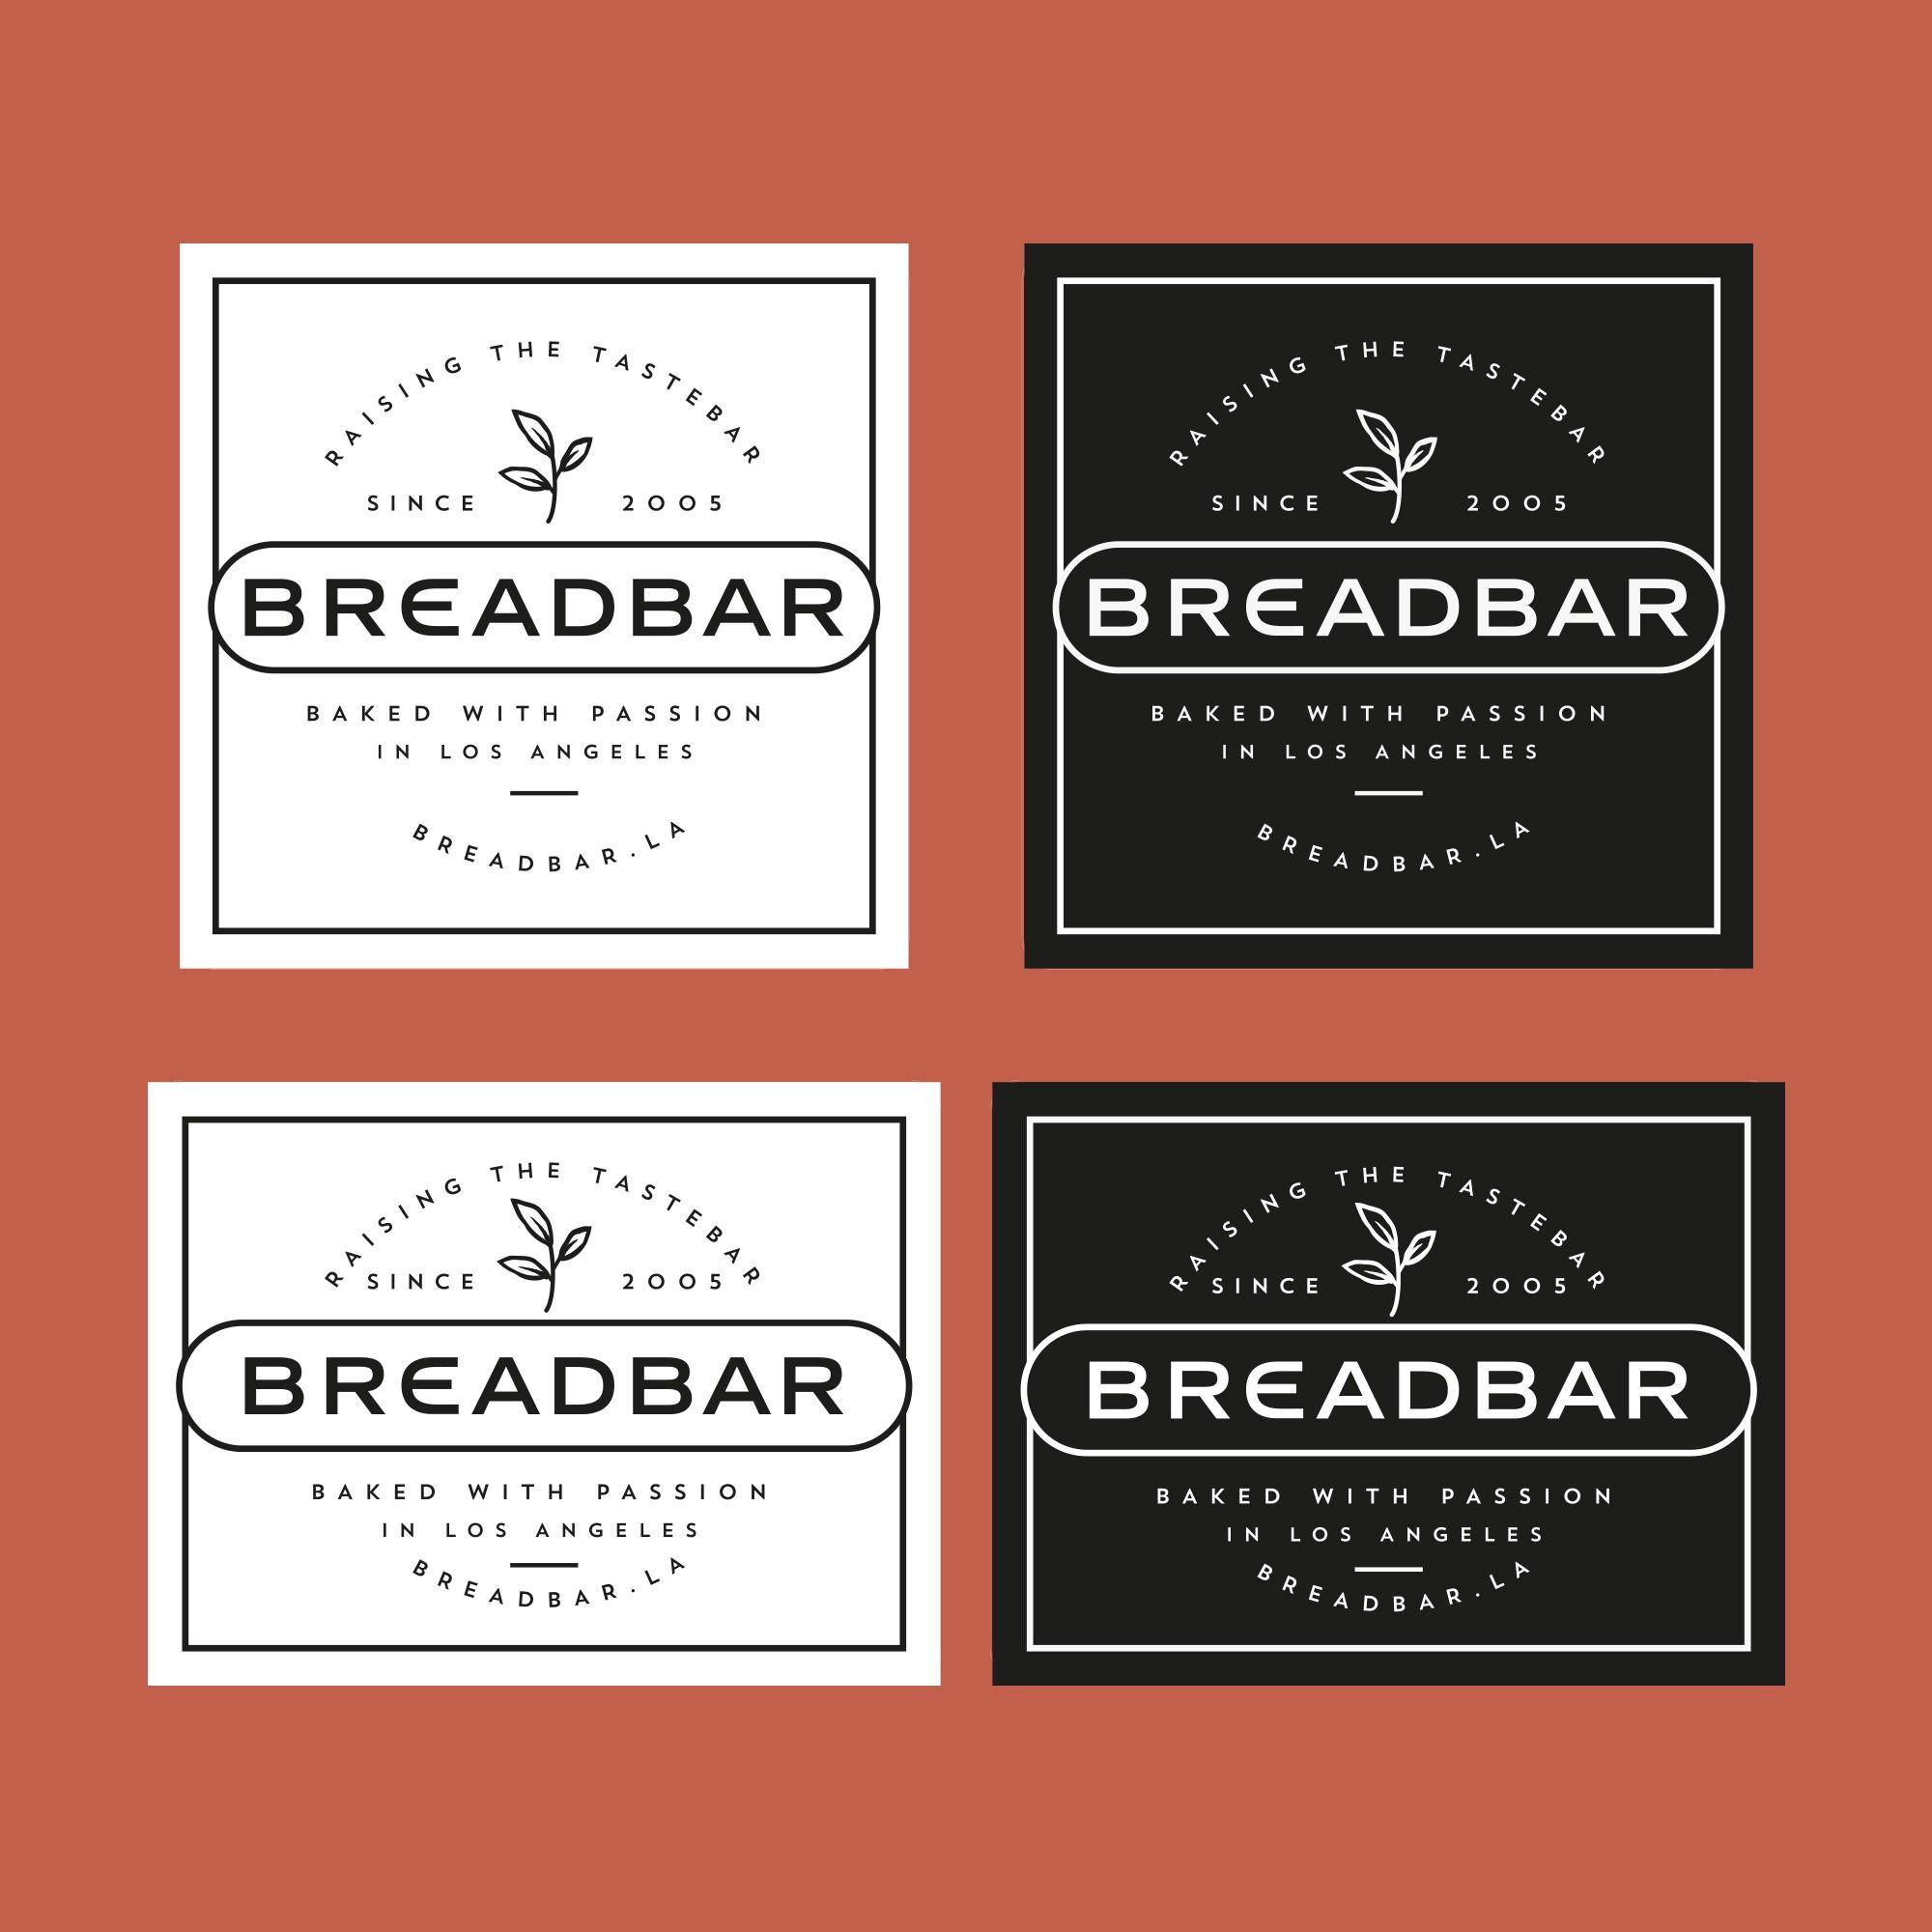 BREADBAR - Stickers continued